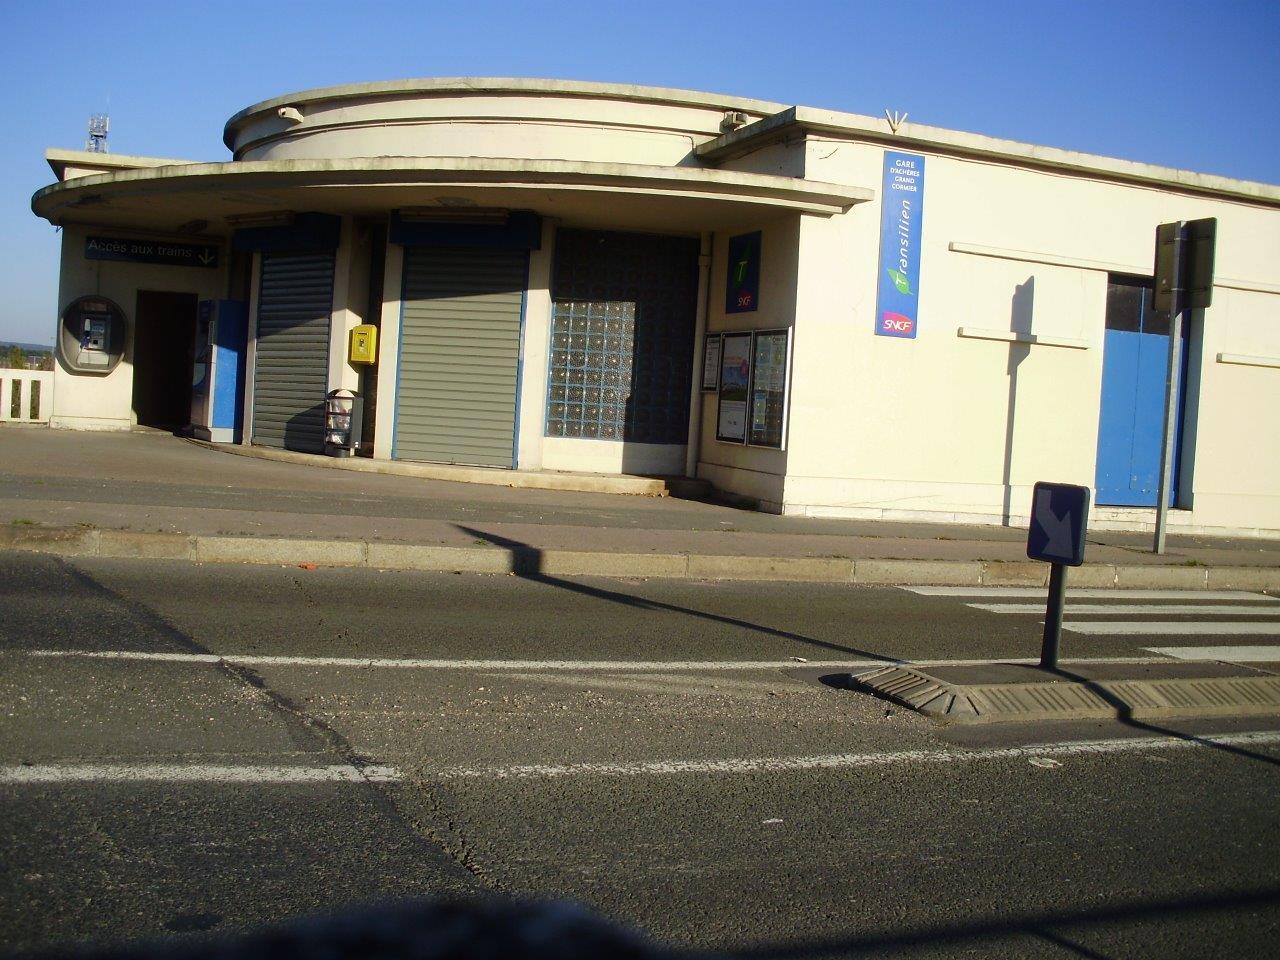 gare-d-acheres-grand-cormier-train-station